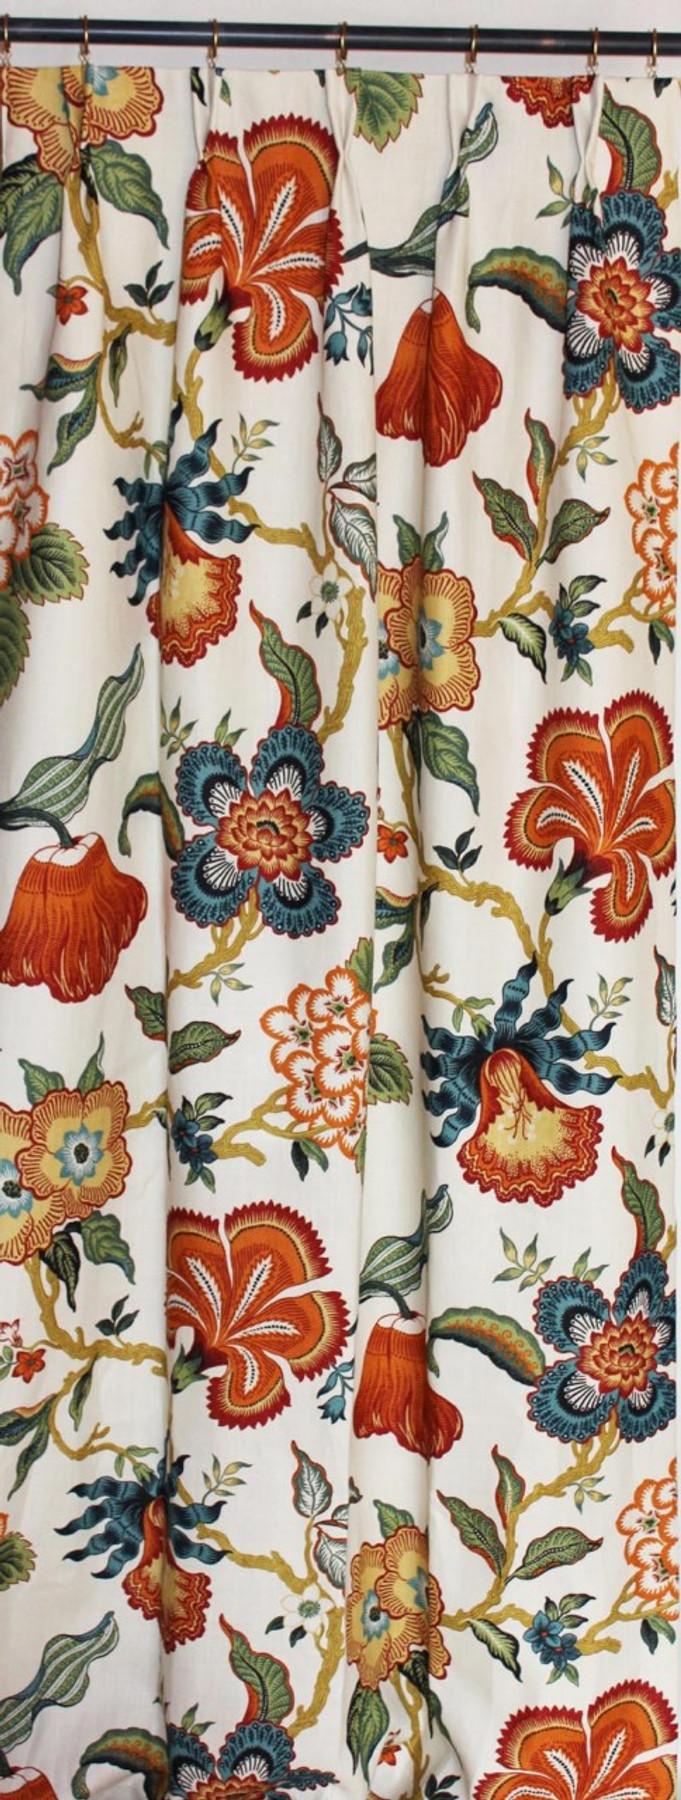 Custom Pleated Drapes by Lynn Chalk in Schumacher Celerie Kemble Hot House Flowers Spark